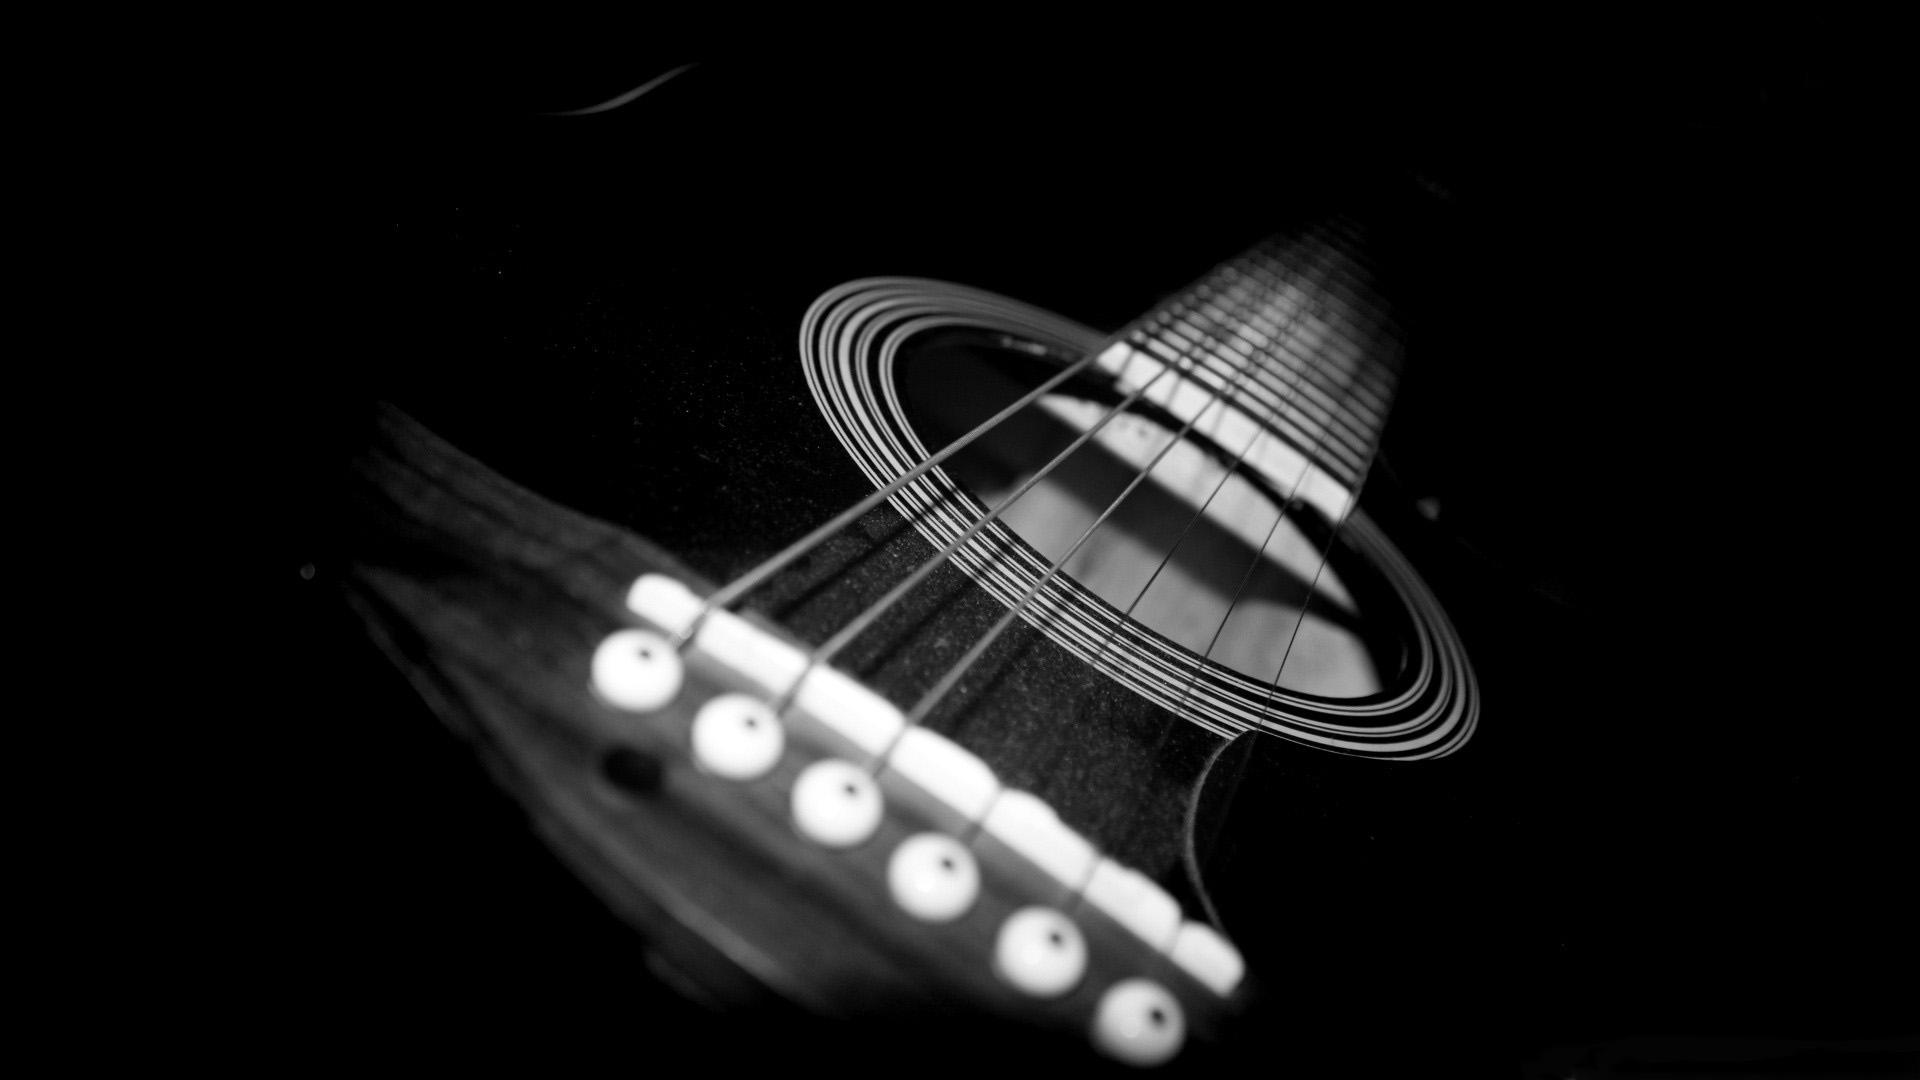 3d Musics Guitar Backgrounds: Guitar Computer Wallpapers, Desktop Backgrounds